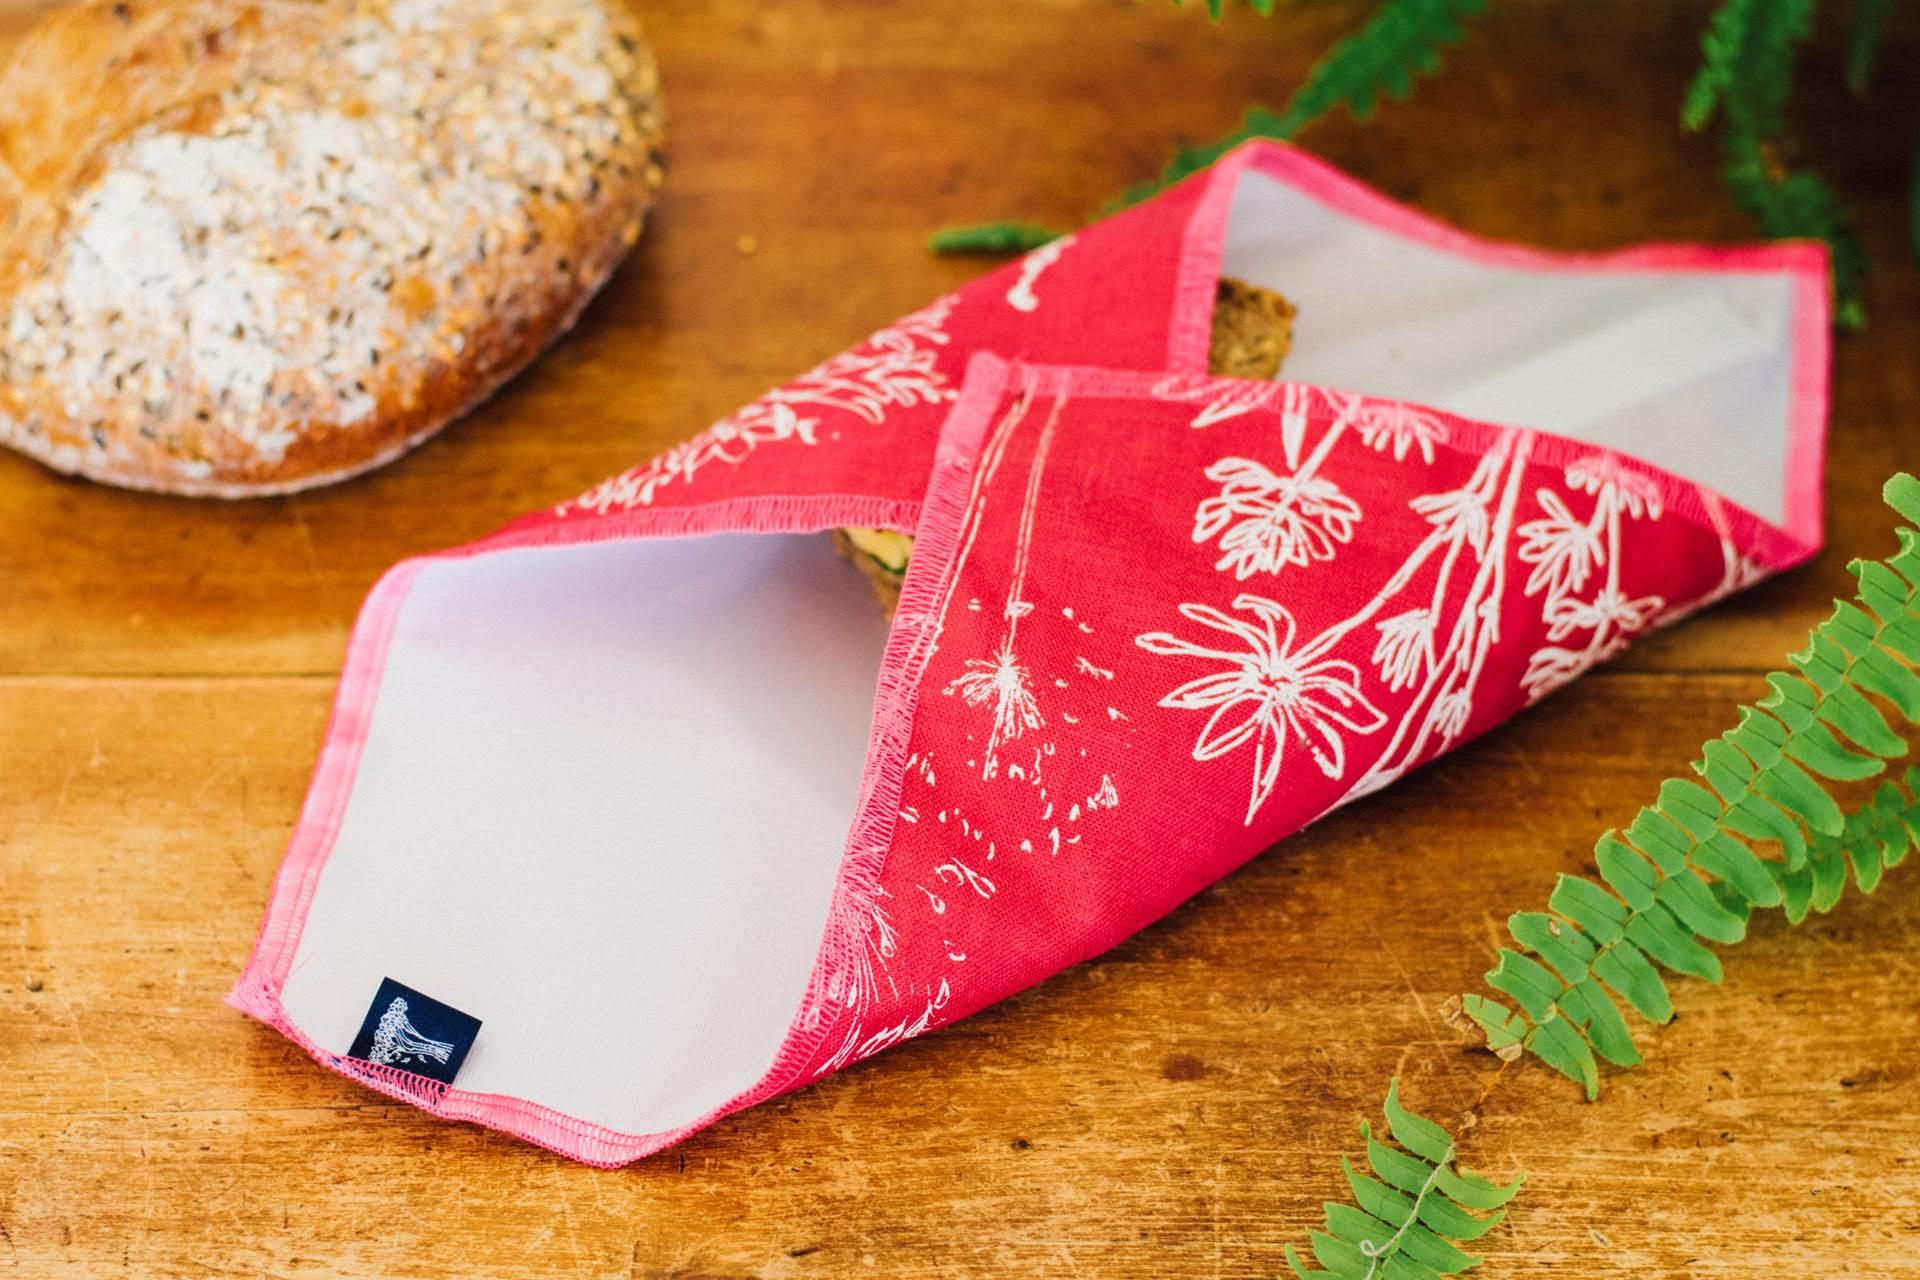 Win a Reusable Sandwich Wrap by Helen Hound - Midlands traveller